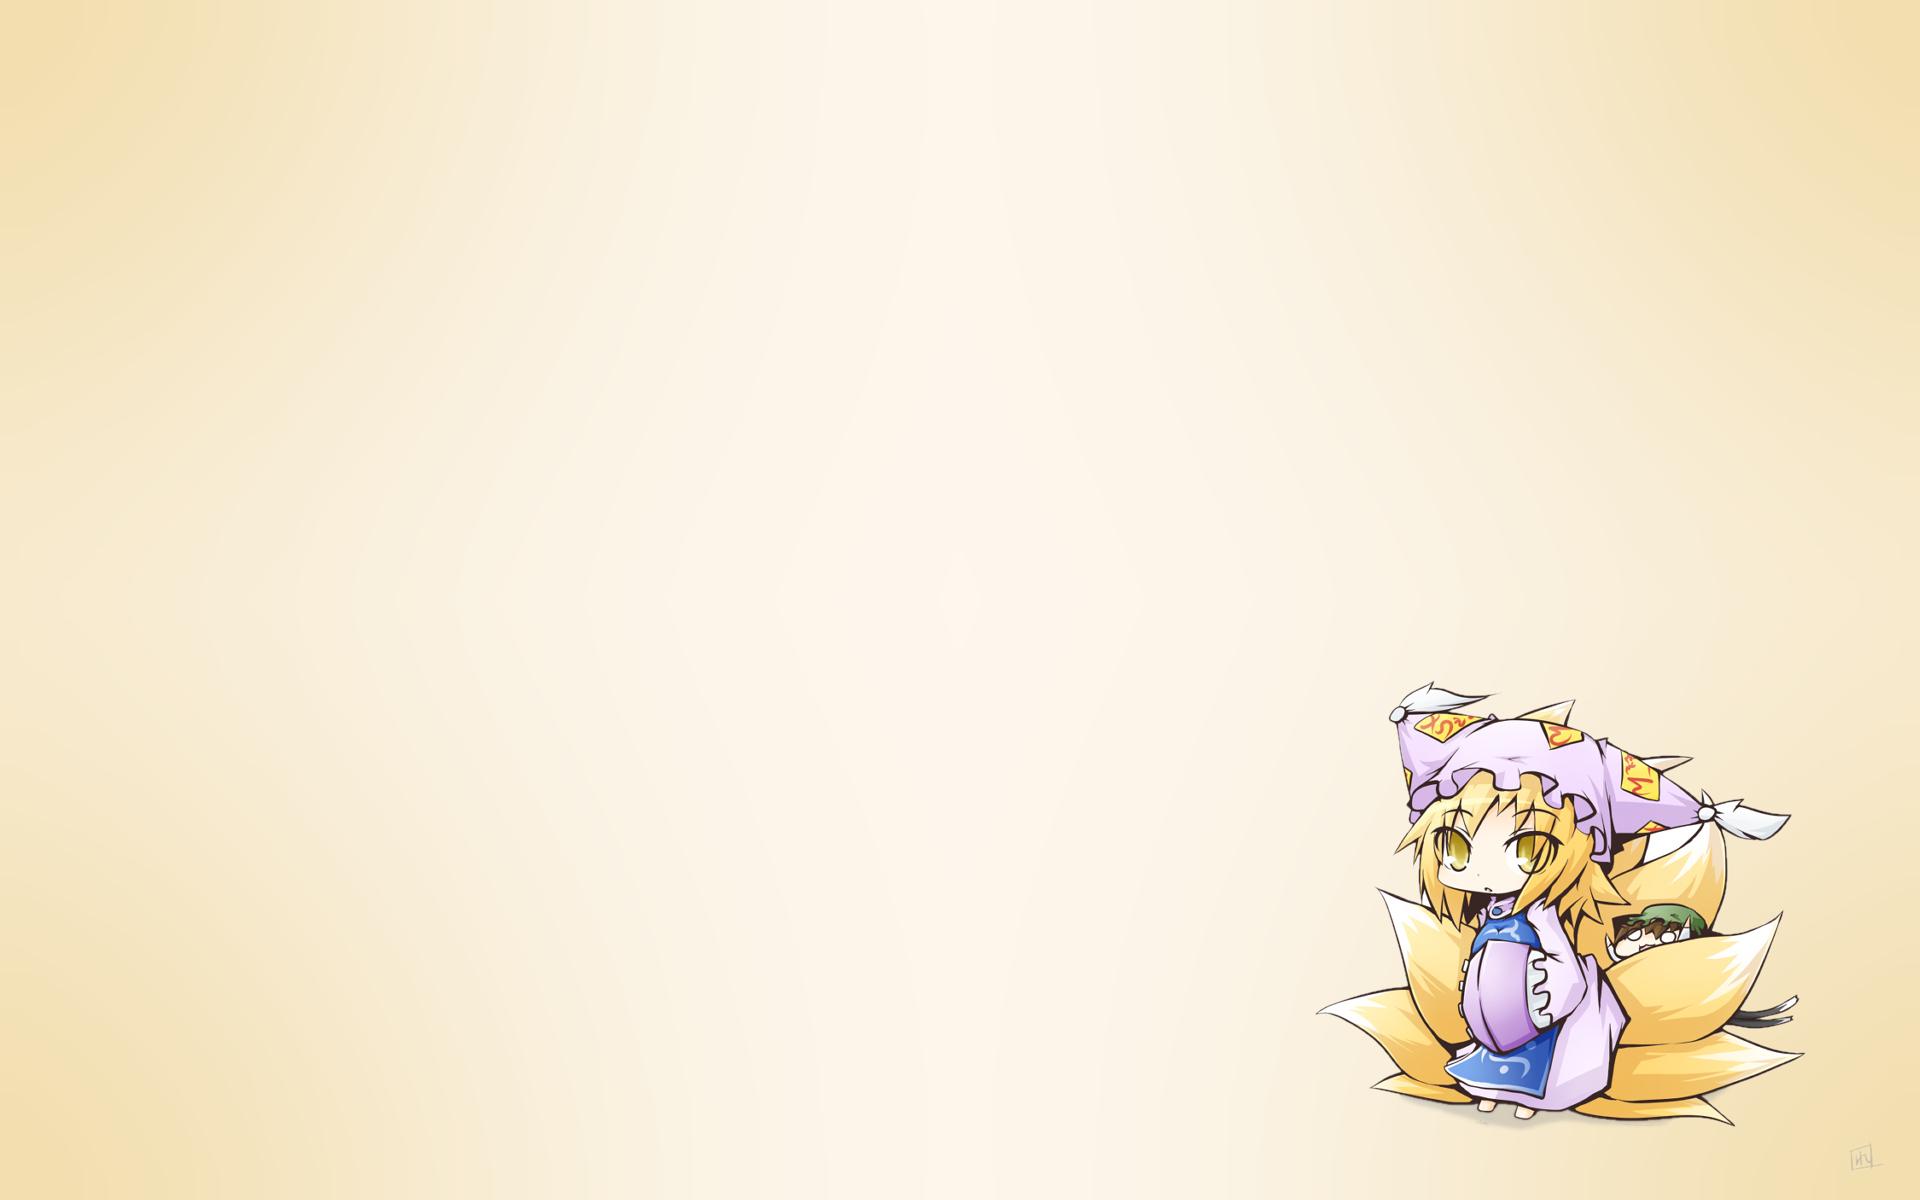 animal_ears catgirl chen chibi foxgirl gradient hat multiple_tails reku short_hair tail touhou yakumo_ran